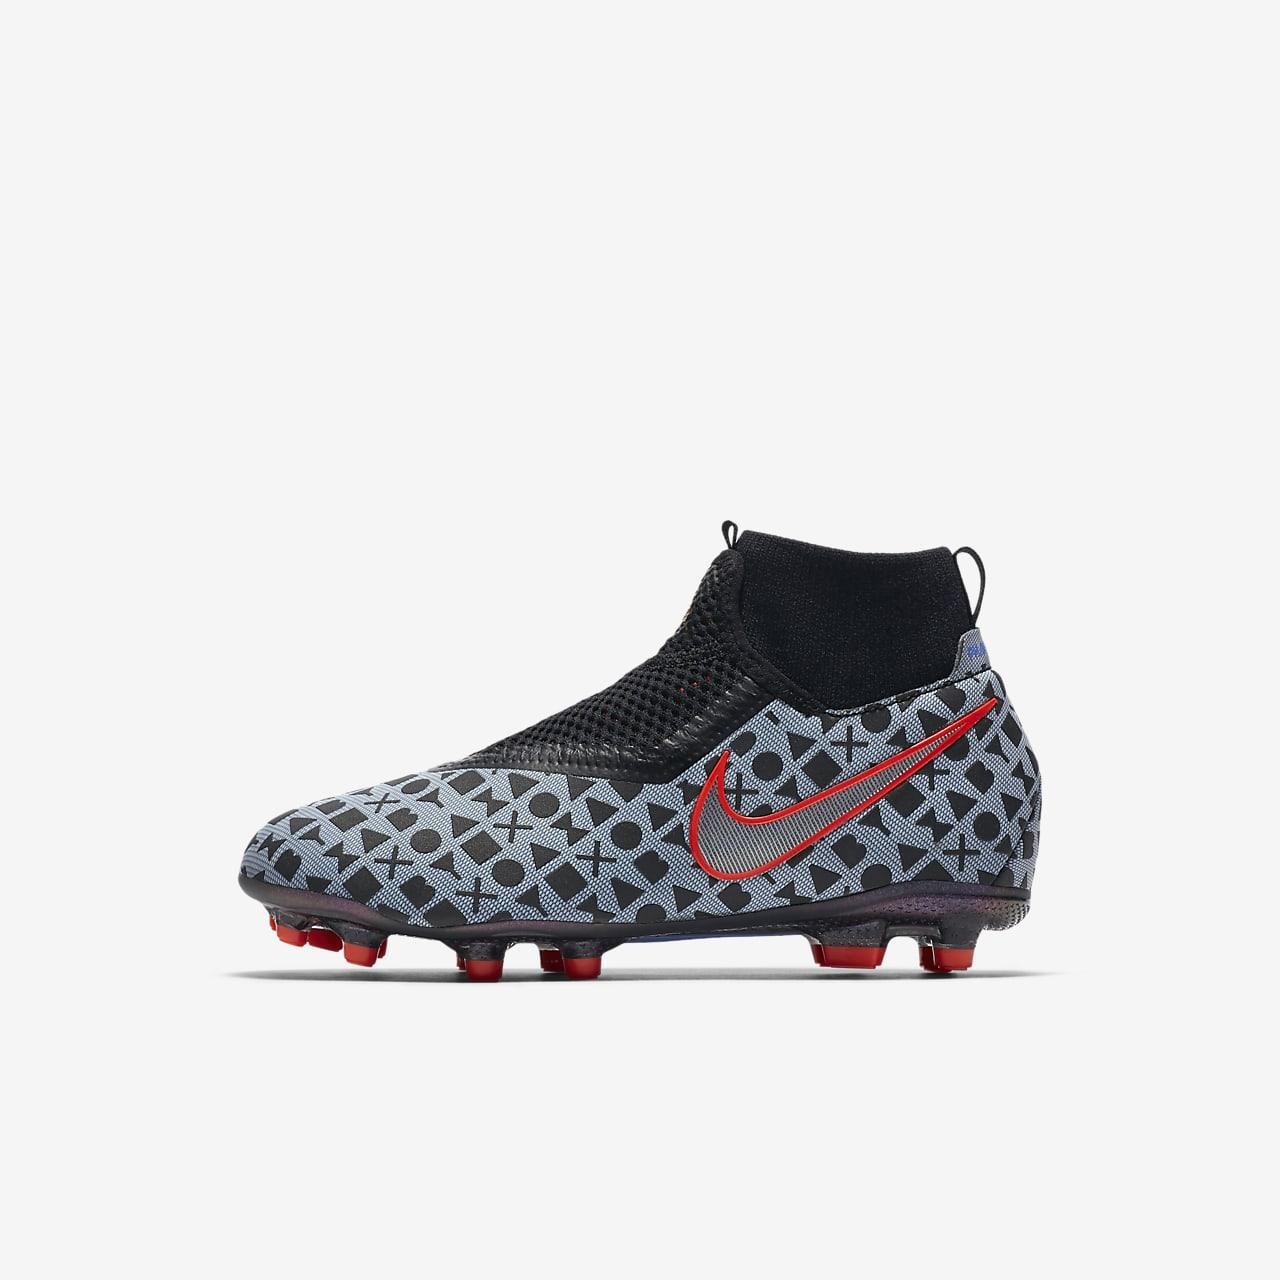 Volver a llamar Reparación posible Superar  Nike Jr. EA Sports X Phantom Vision Academy Dynamic Fit MG Younger/Older  Kids' Multi-Ground Football Boot. Nike ID